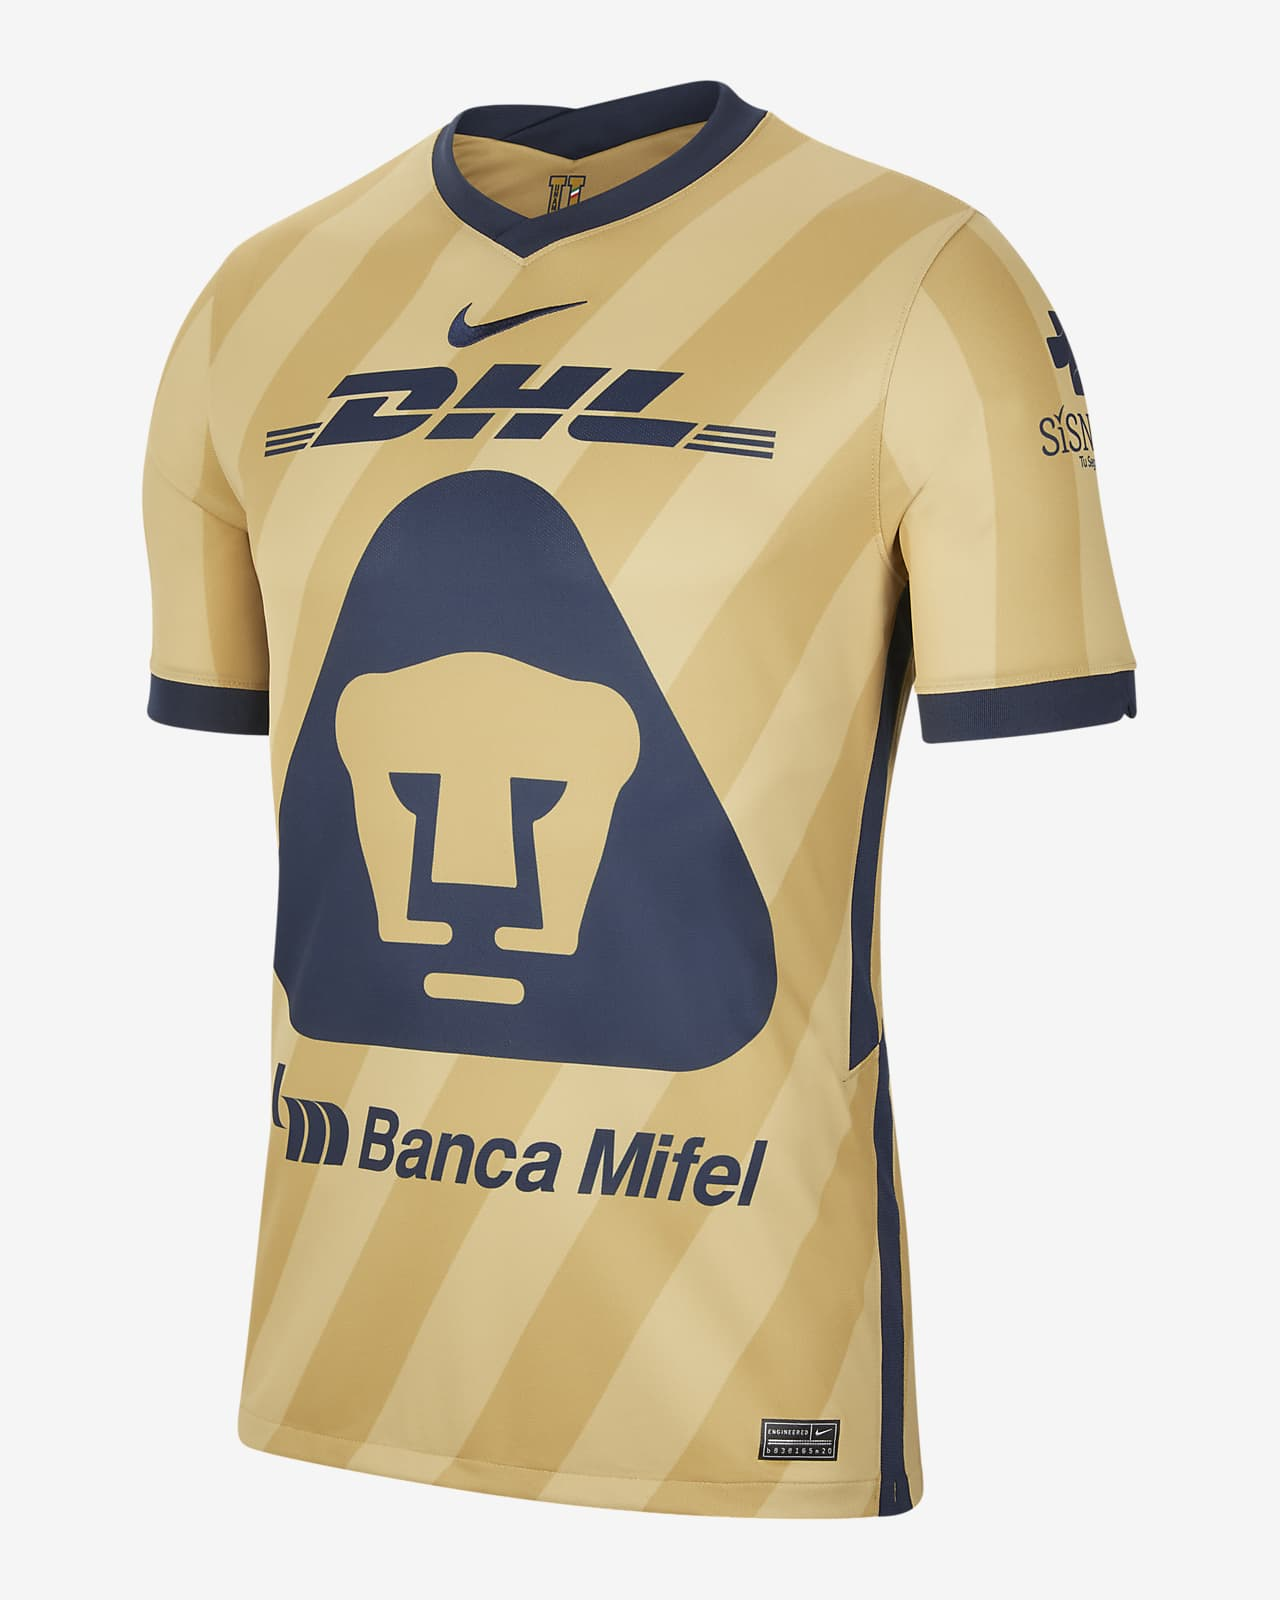 Pumas UNAM 2020/21 Stadium Third Men's Football Shirt